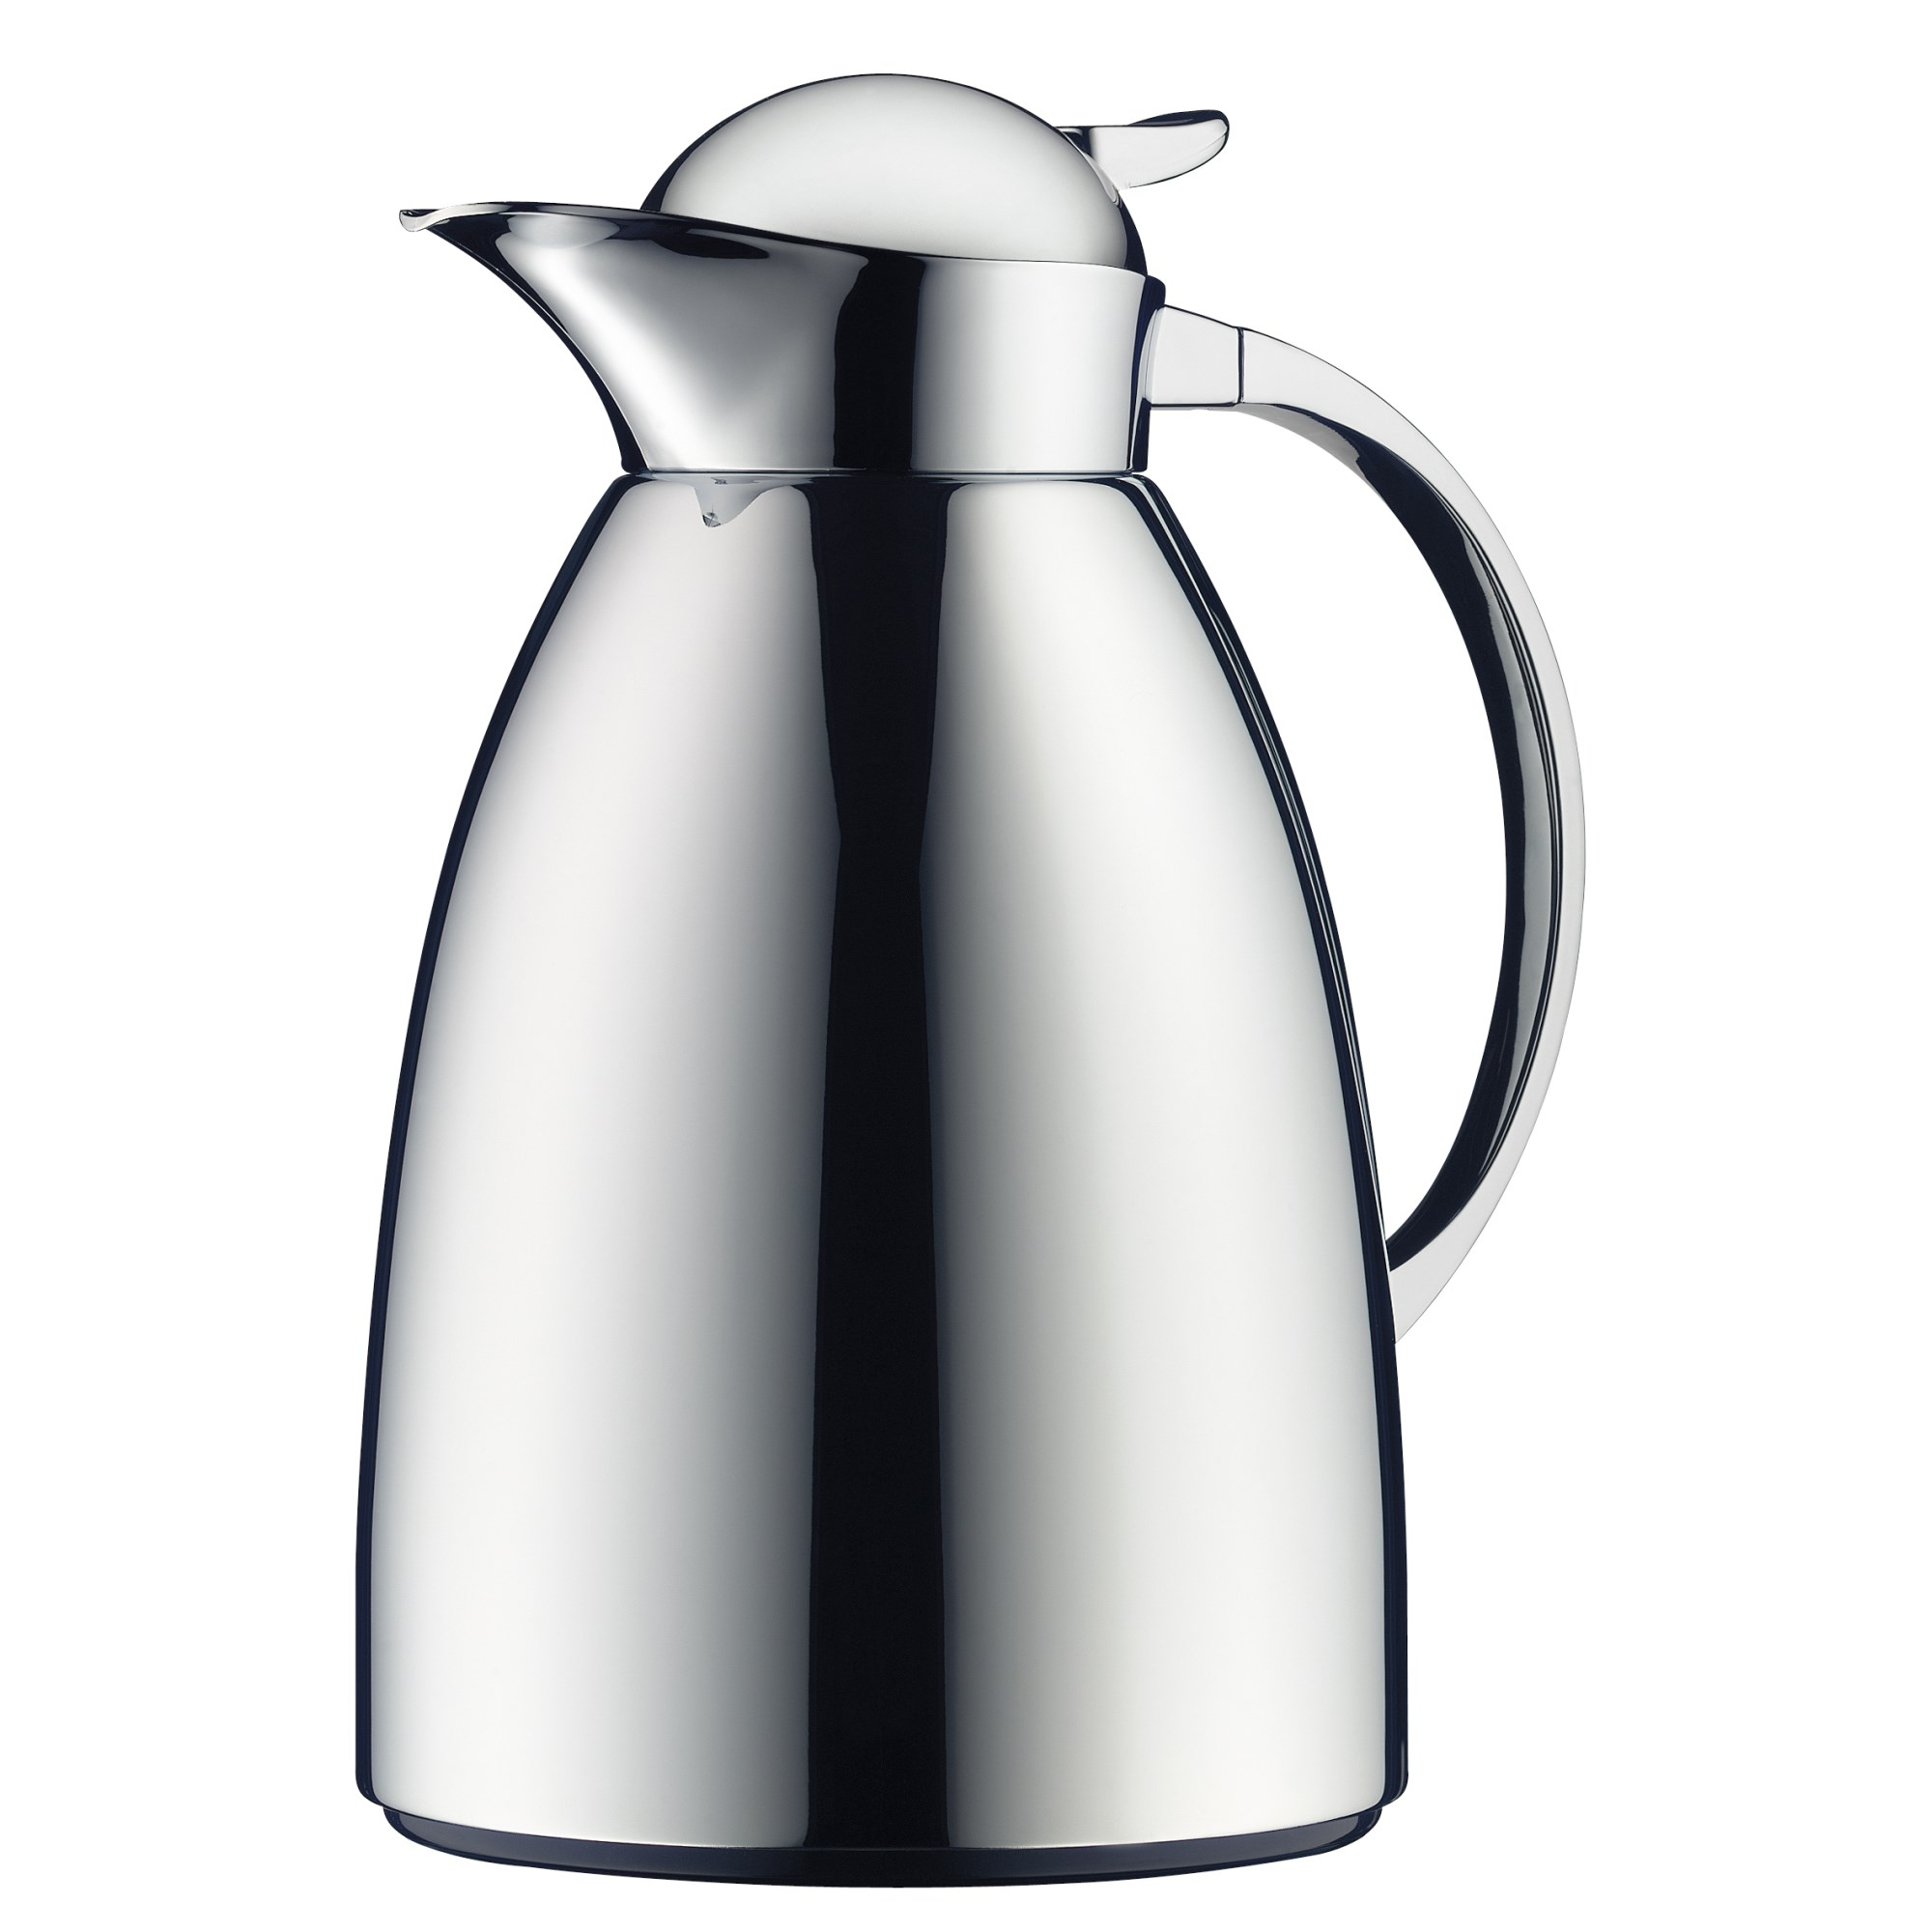 alfi isolierkanne albergo tea 1 0 liter mit teefilter metall verchromt ebay. Black Bedroom Furniture Sets. Home Design Ideas